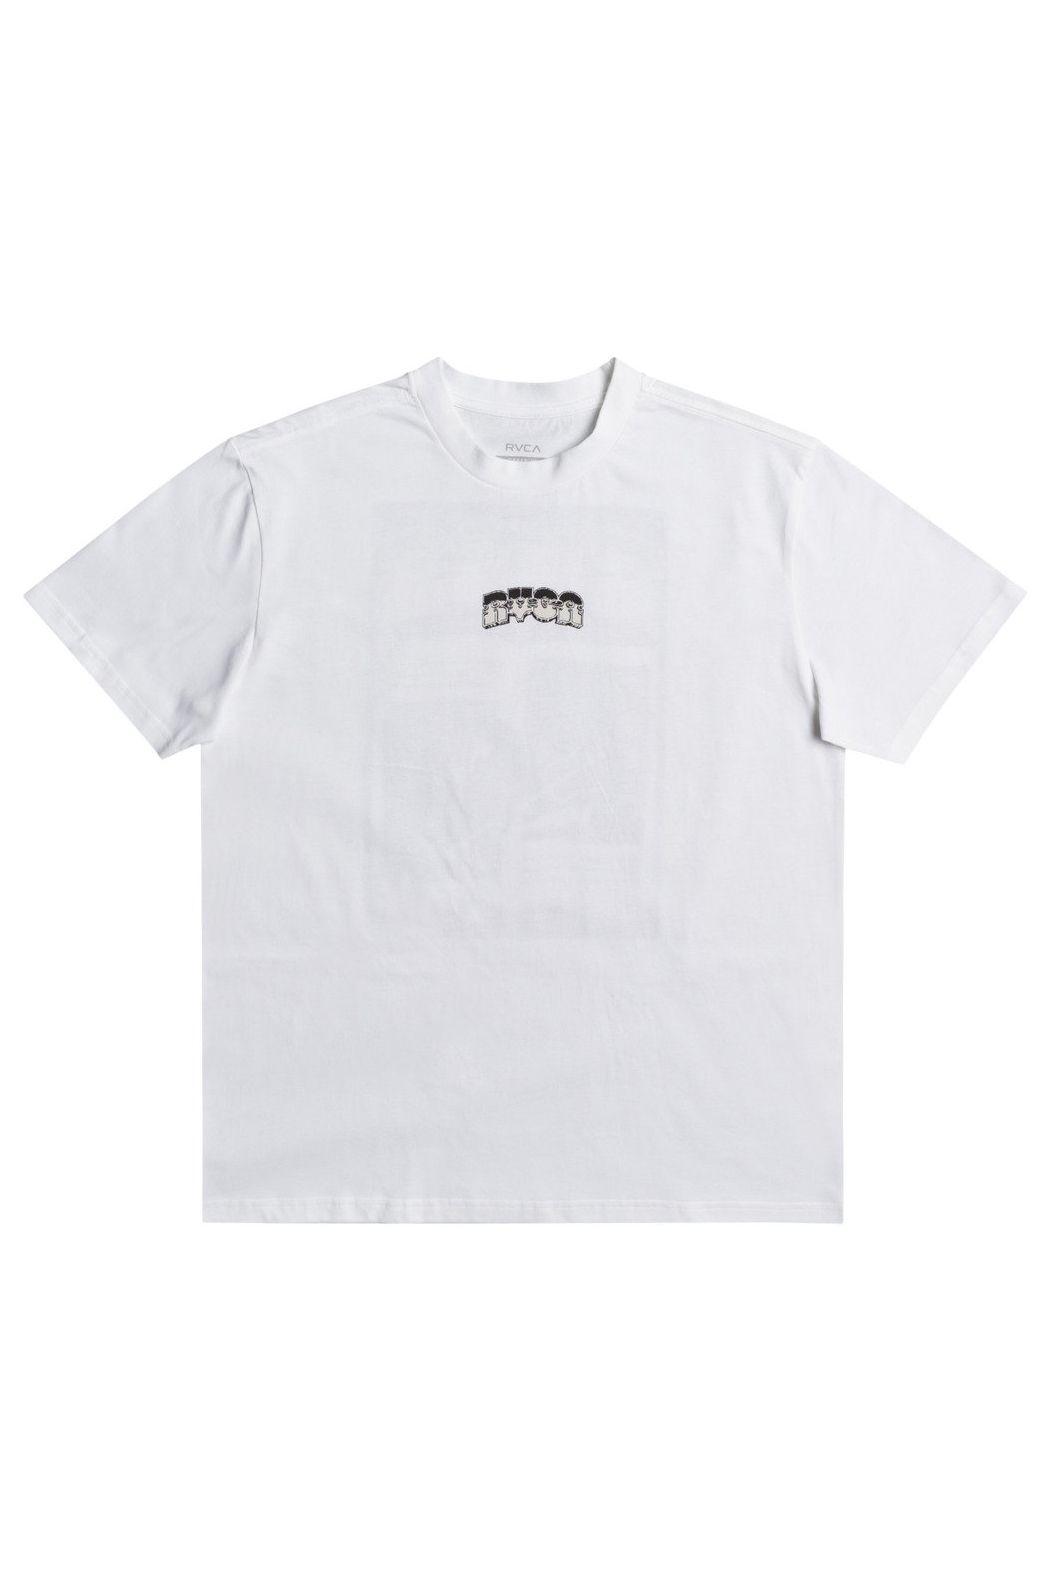 RVCA T-Shirt BATTLE MARTIN ANDER White